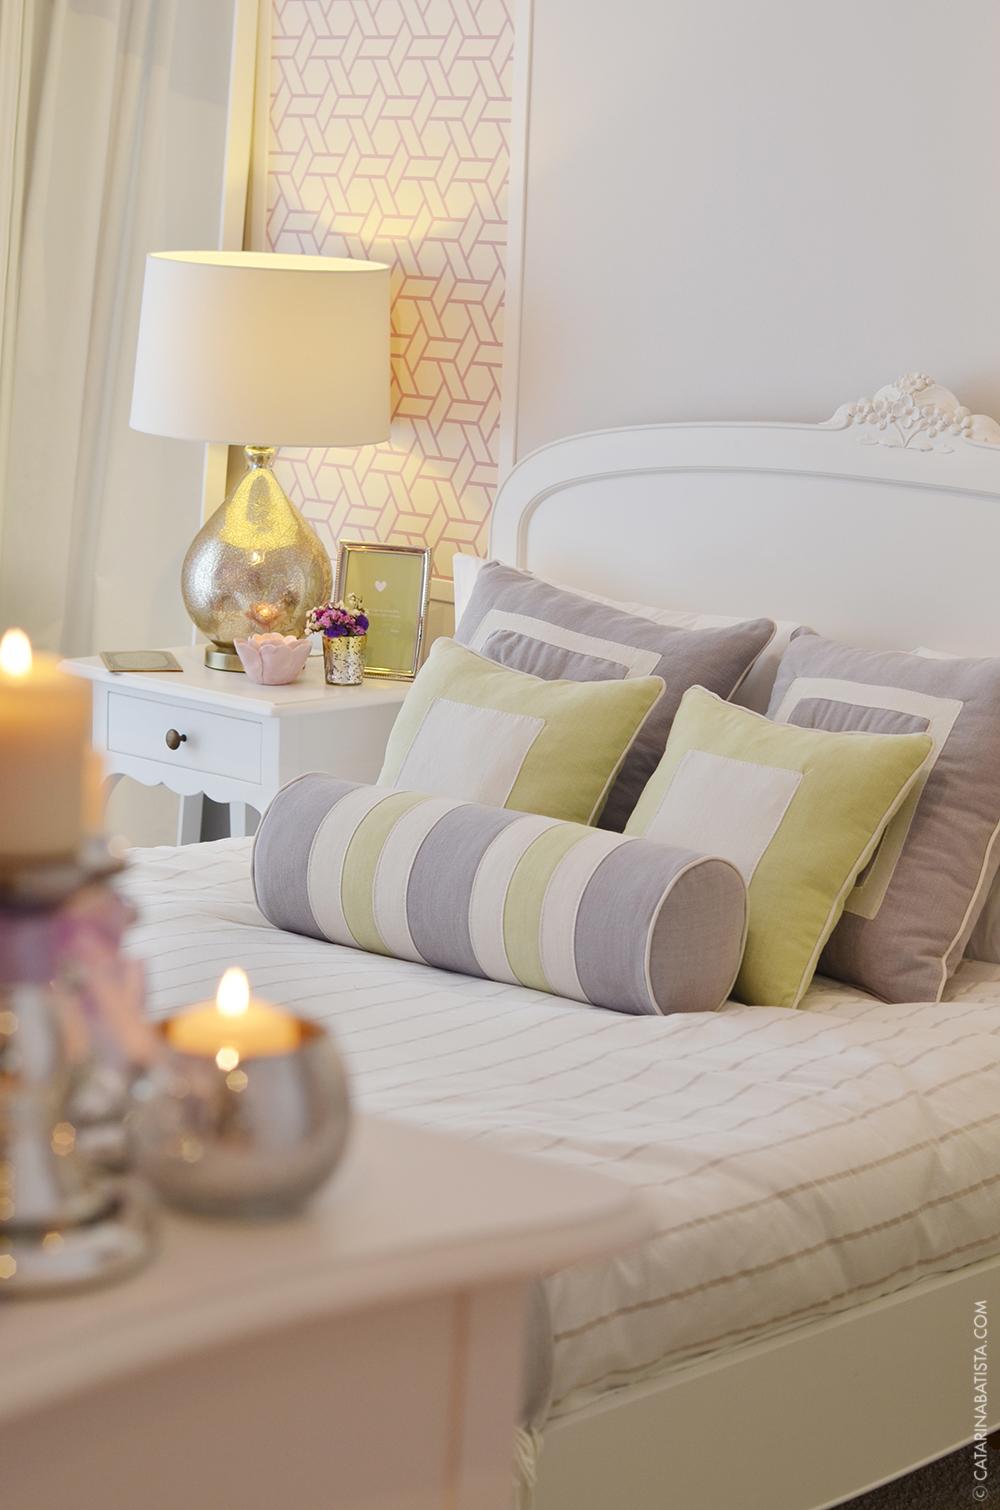 38-catarina-batista-arquitectura-design-interior-decoracao--apartamento-quarto-bedroom-livingroom-sala.jpg